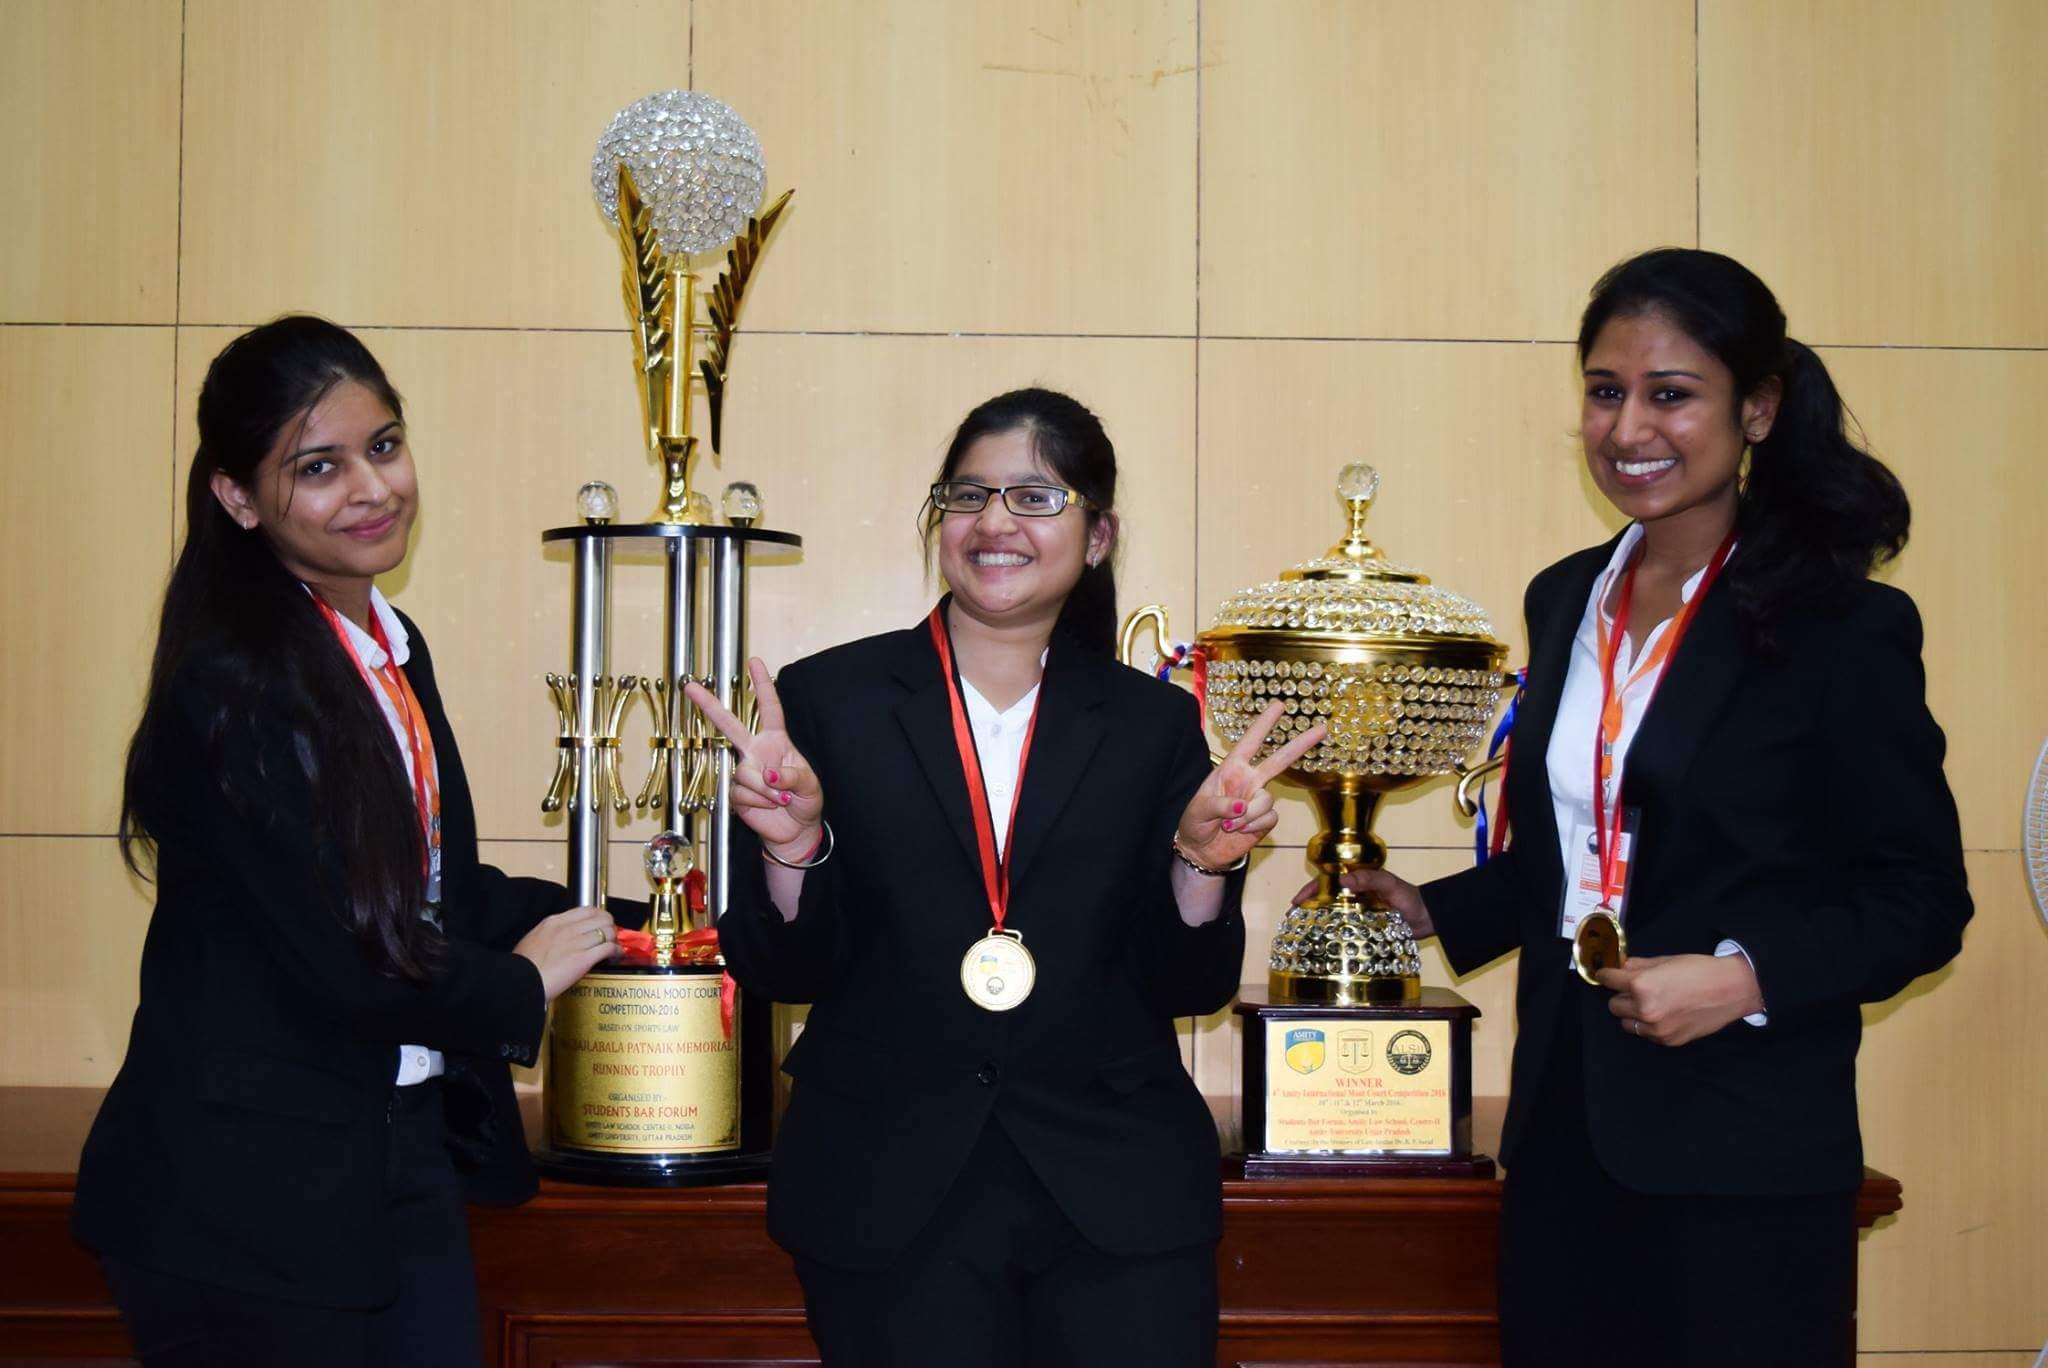 Interview: Winning Team [RGNUL Patiala] of 4th Amity International Moot